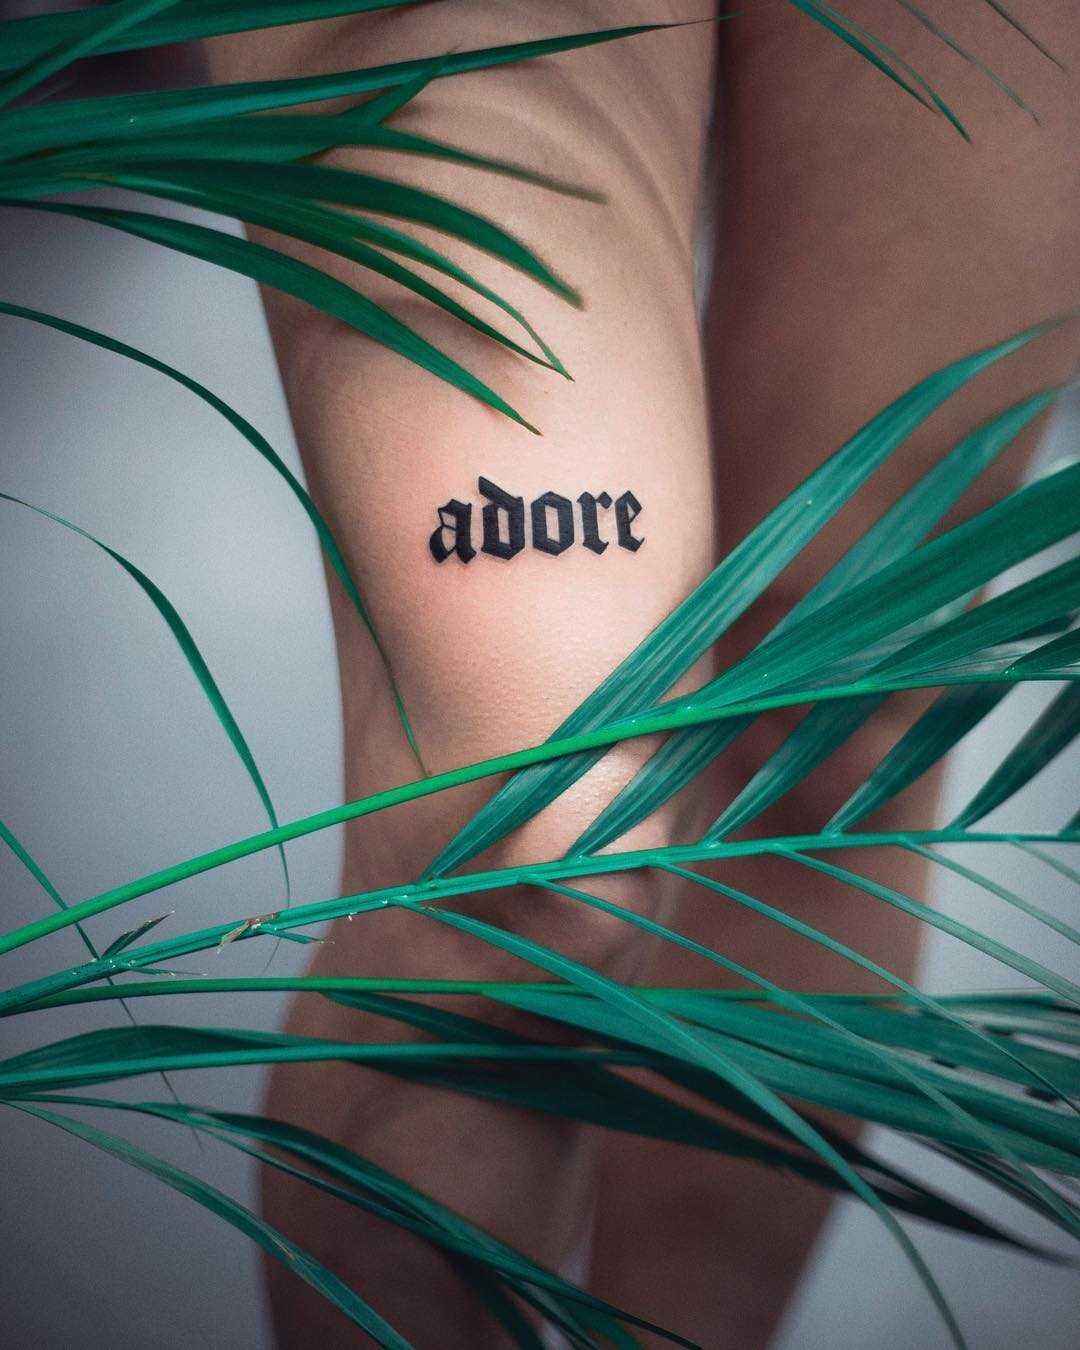 Adore tattoo by Dżudi Bazgrole